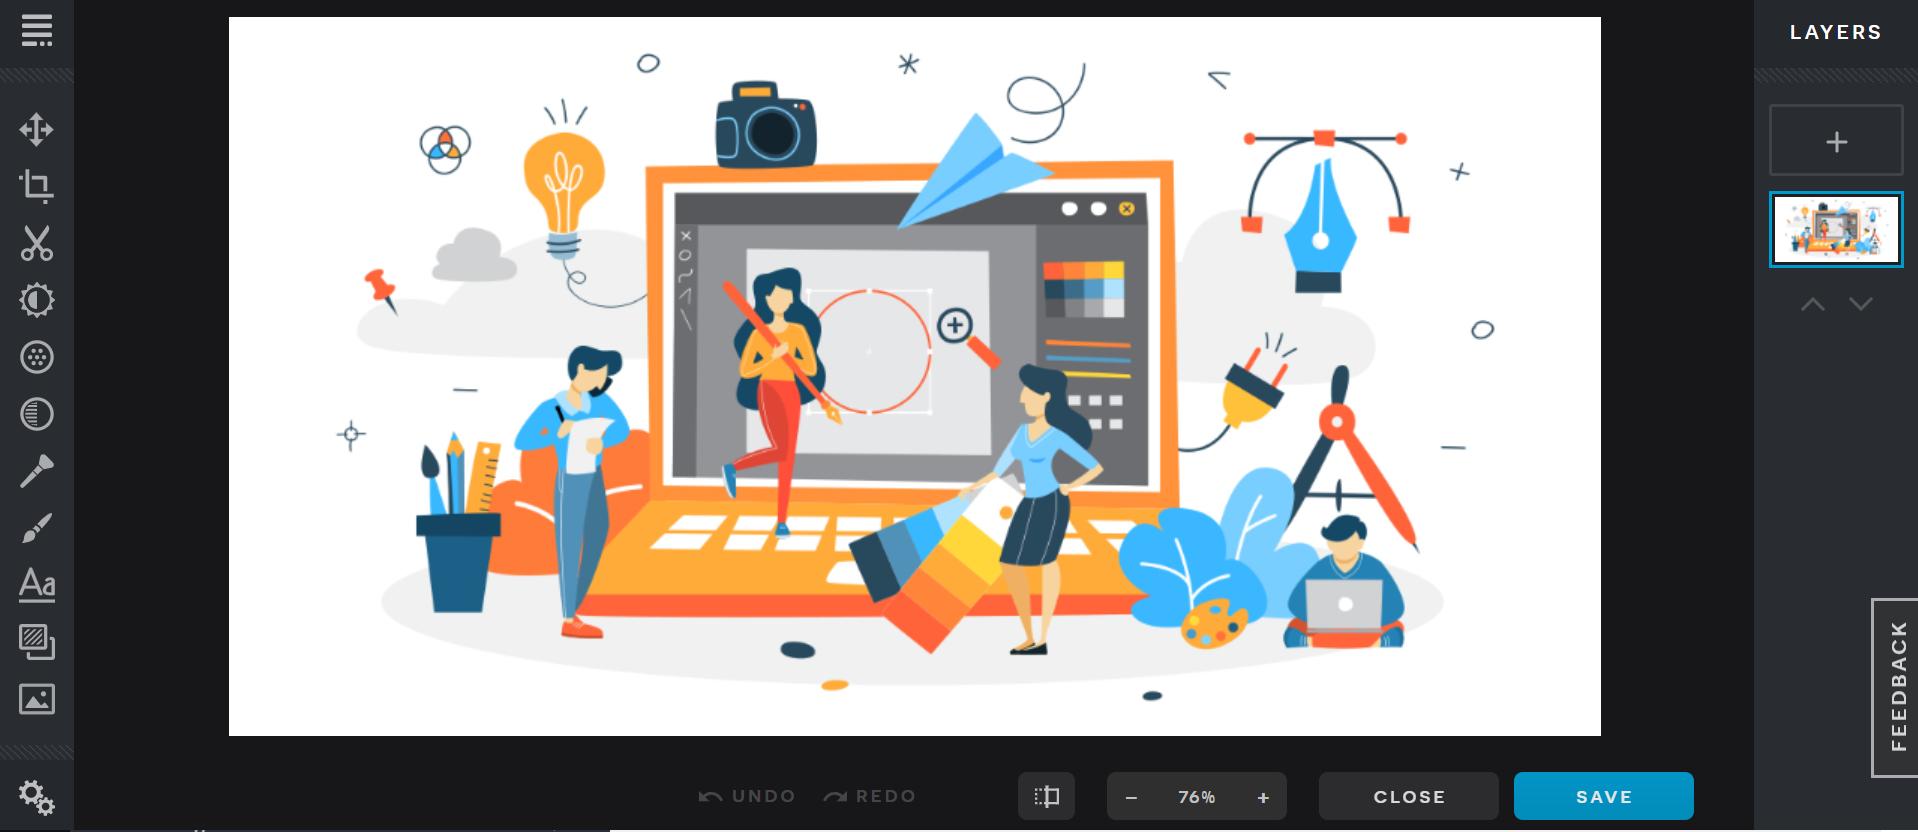 pixlr graphic design software